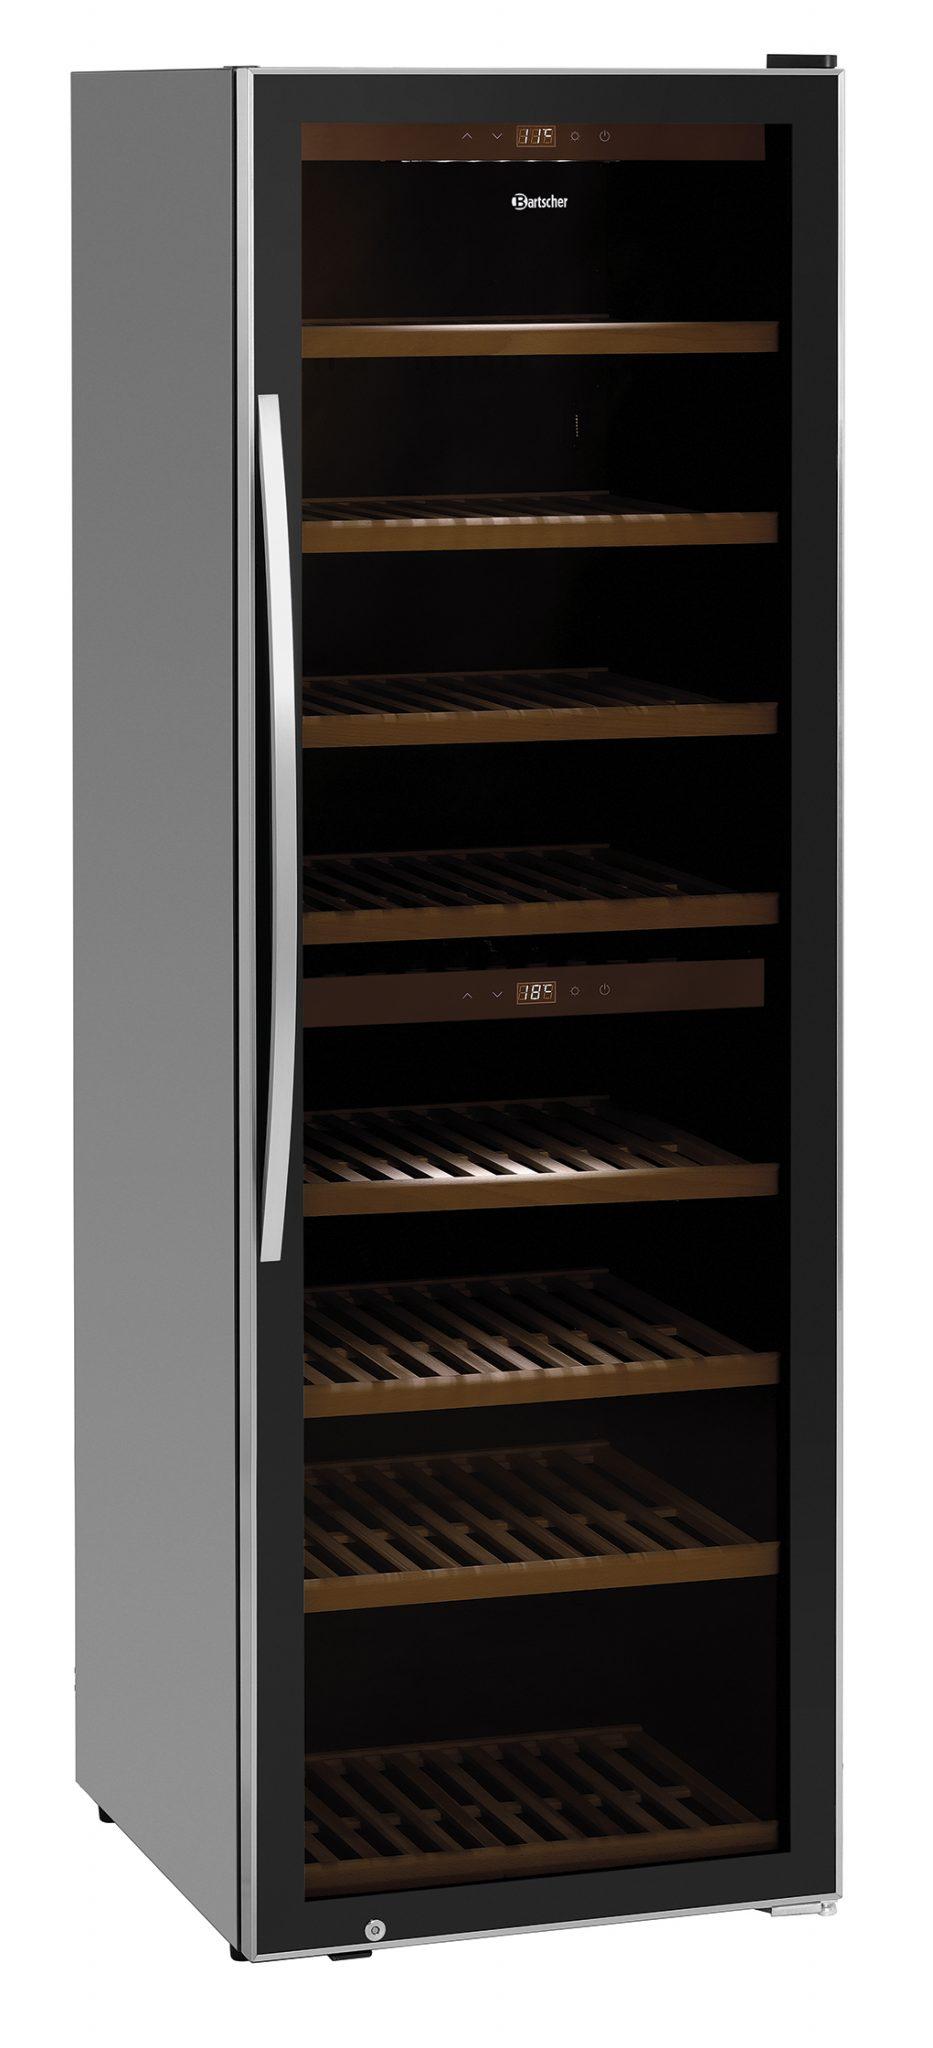 Bartscher Wijnkoelkast 2 Zones 180FL - 453 liter - Zwart